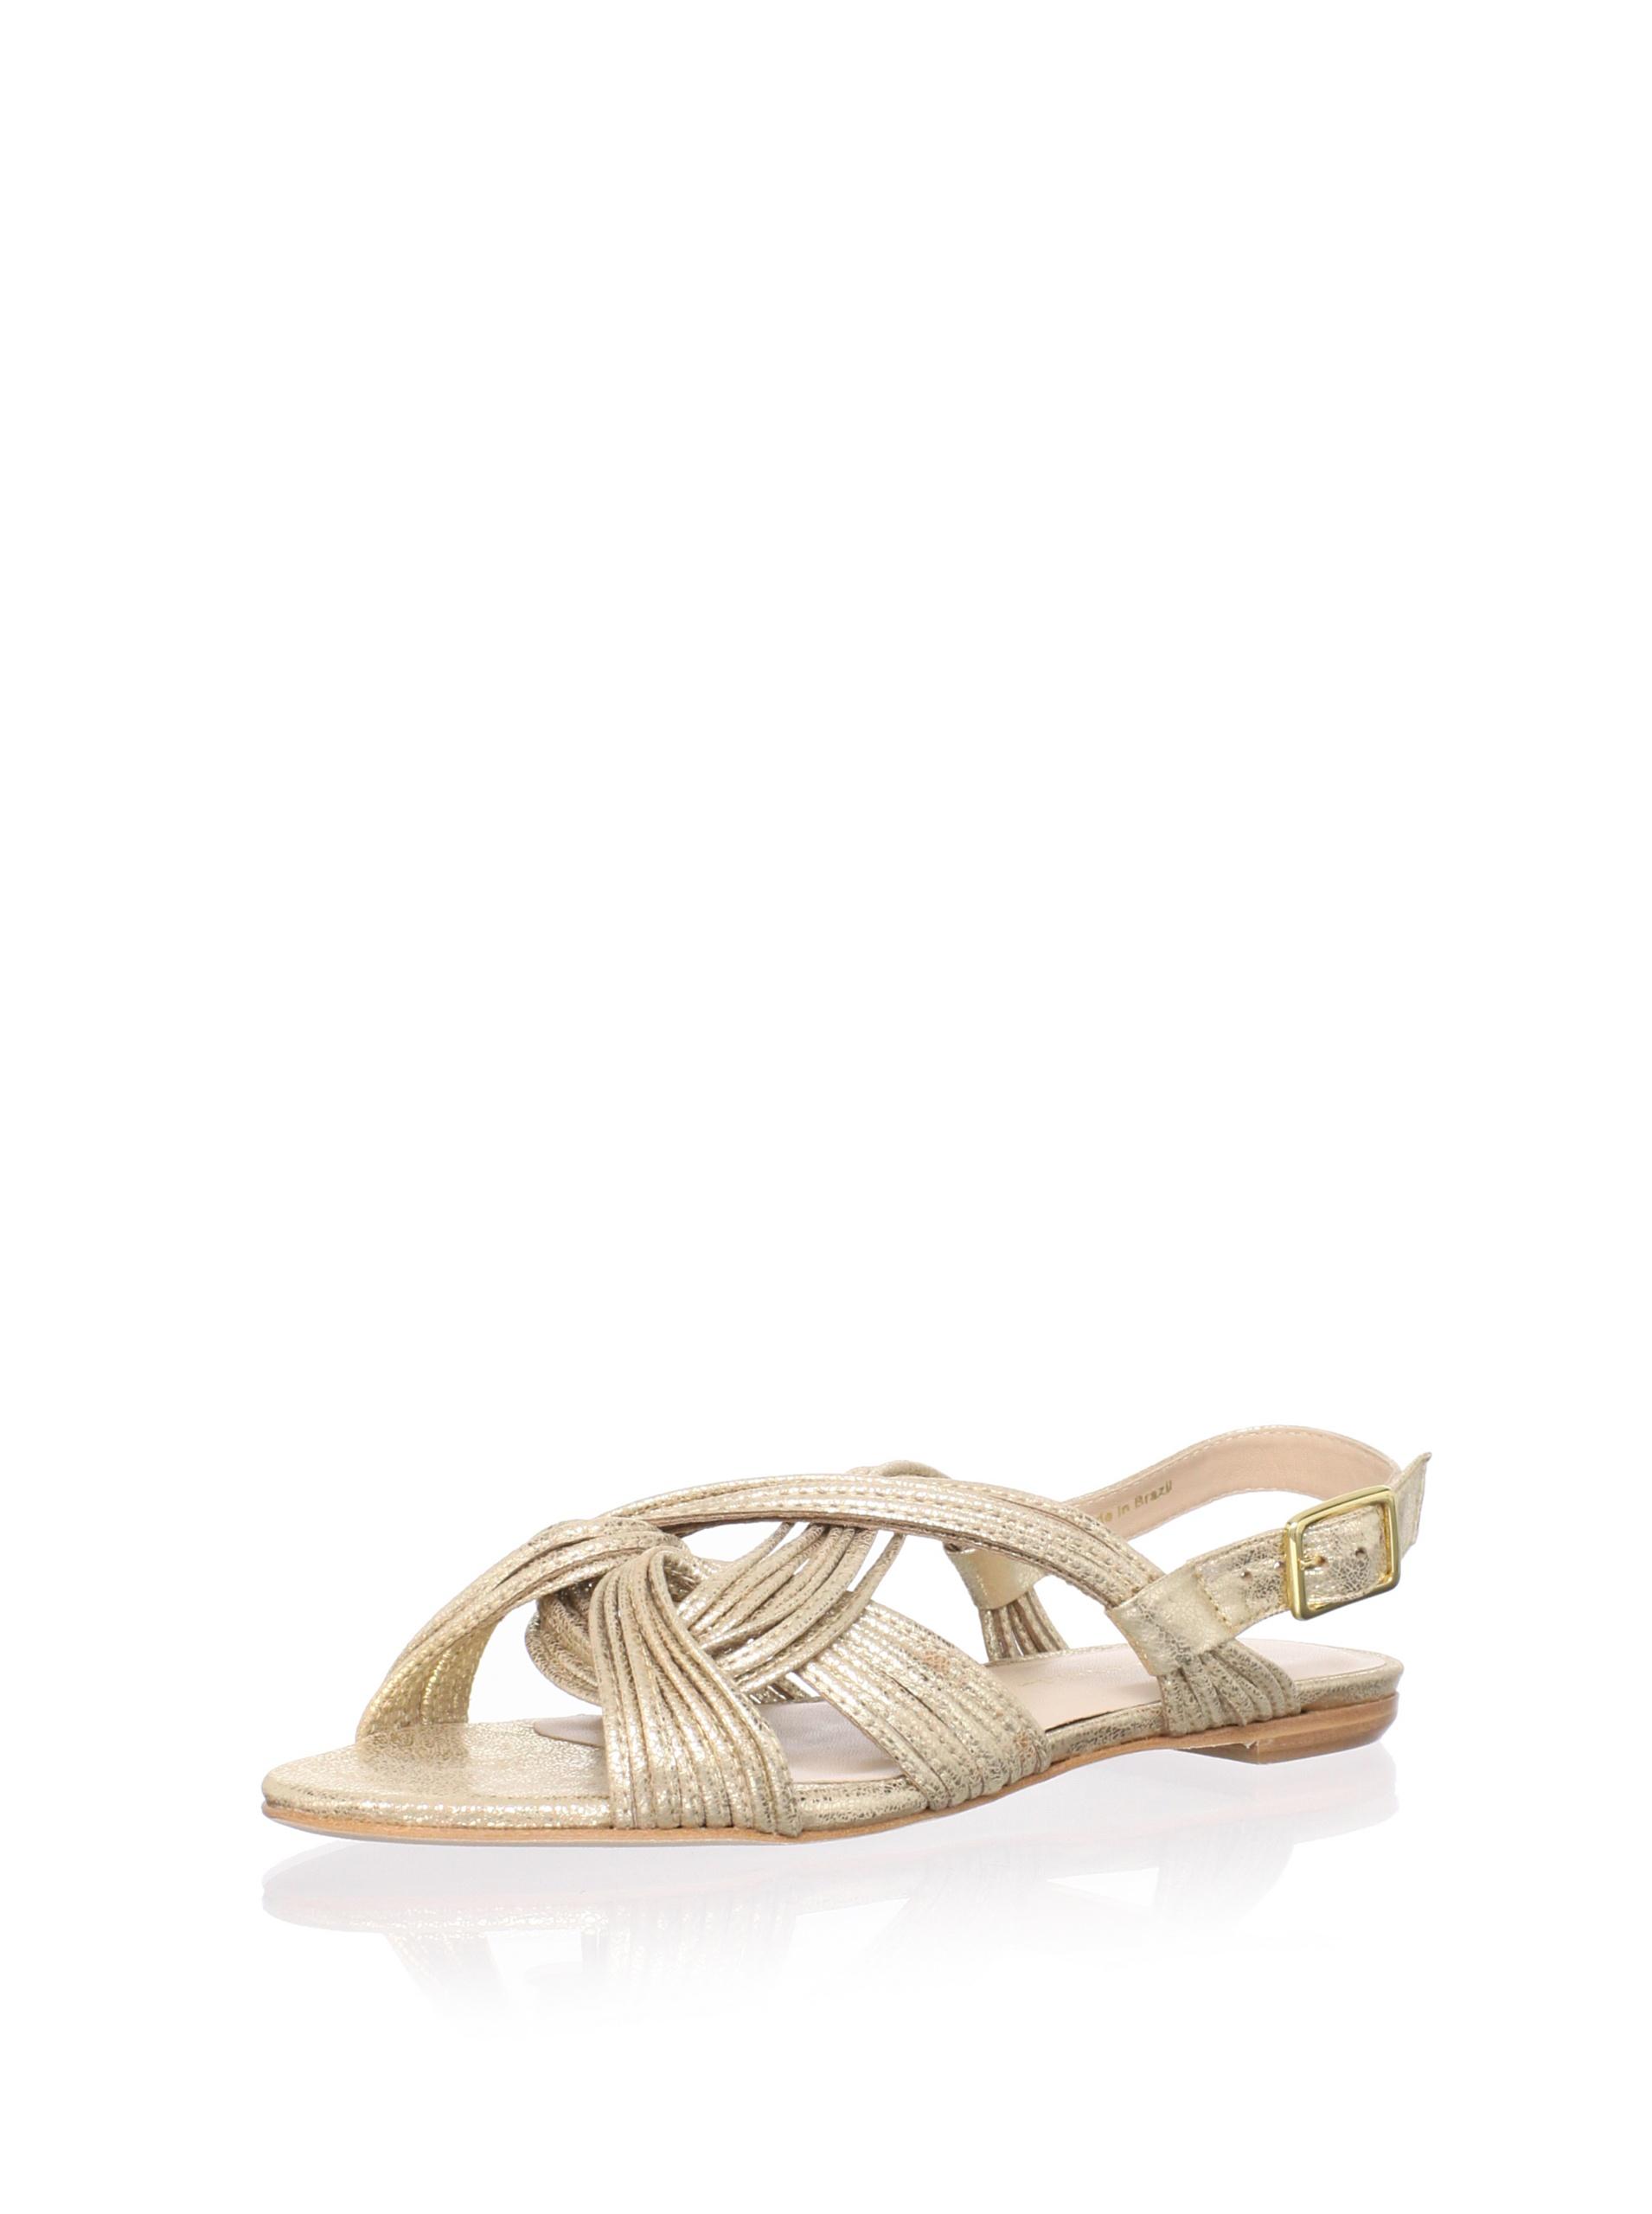 Loeffler Randall Women's Filippa Ankle-Strap Sandal (Pale Gold Metallic)